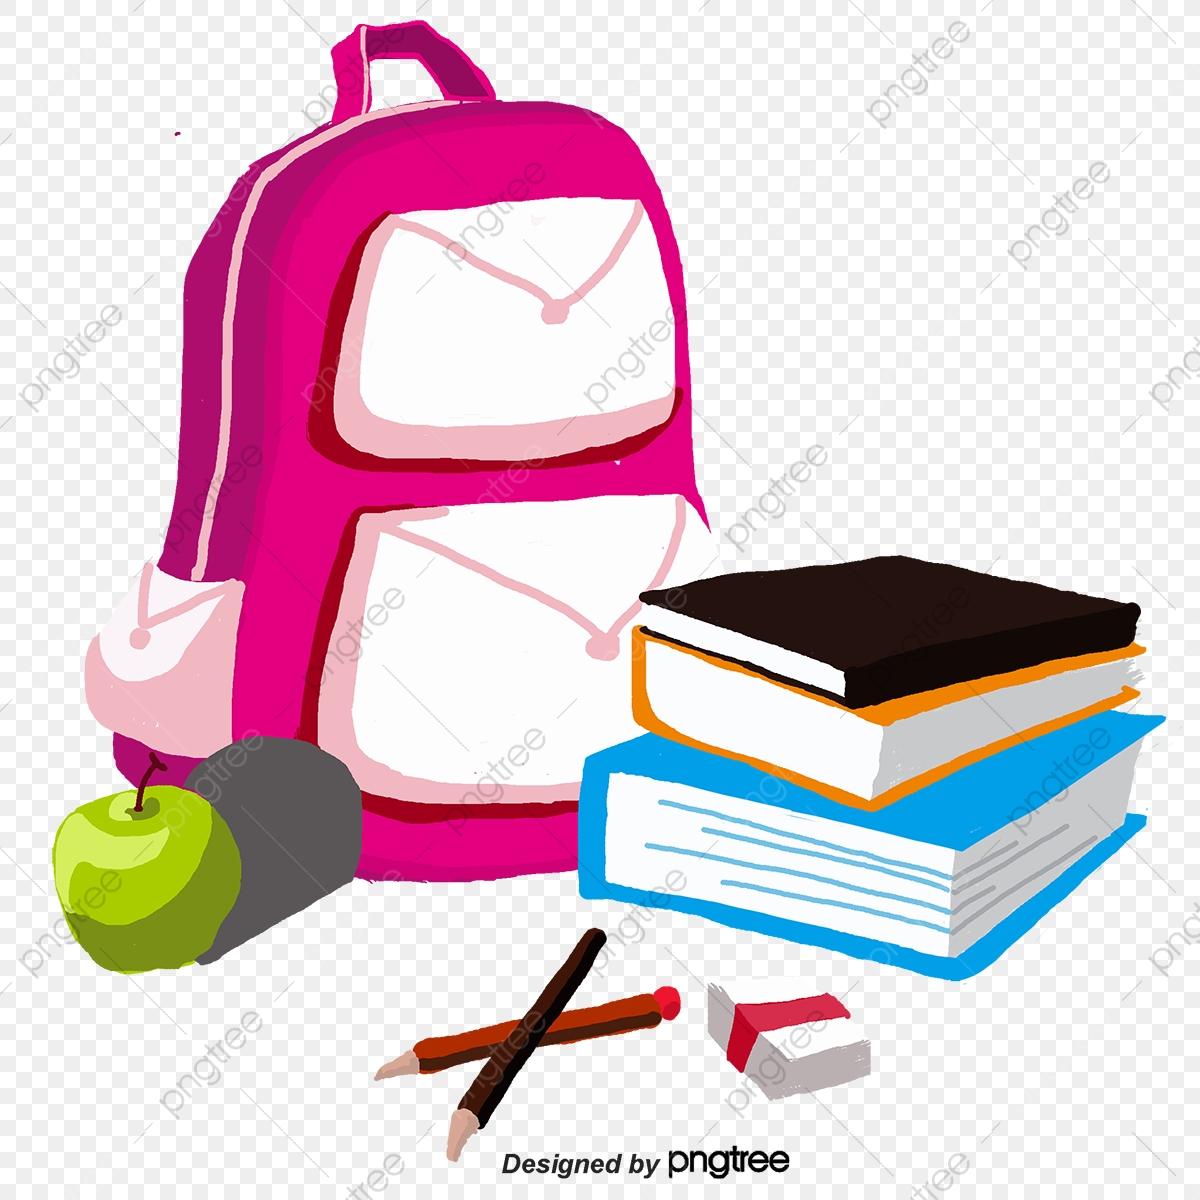 Book bag vector png. Bookbag clipart green backpack